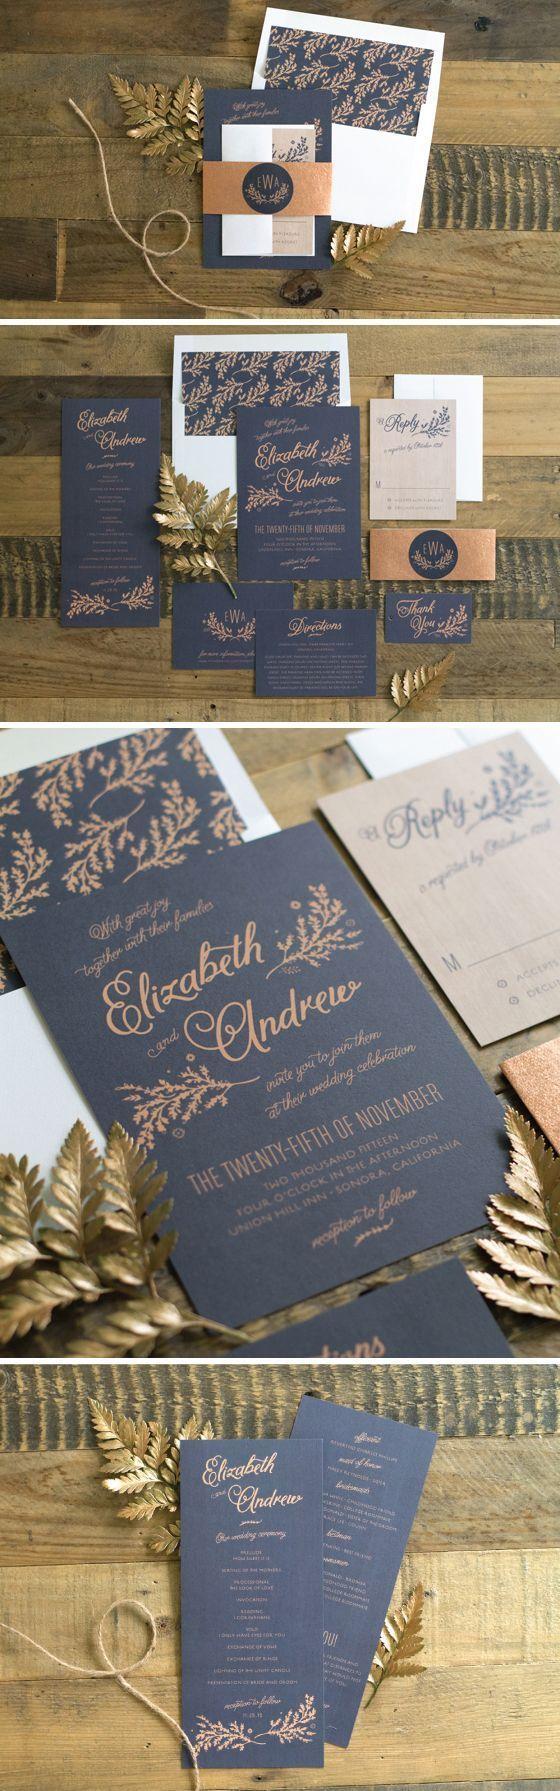 summer fete wedding invitations%0A Rustic Wedding Invitations in Navy